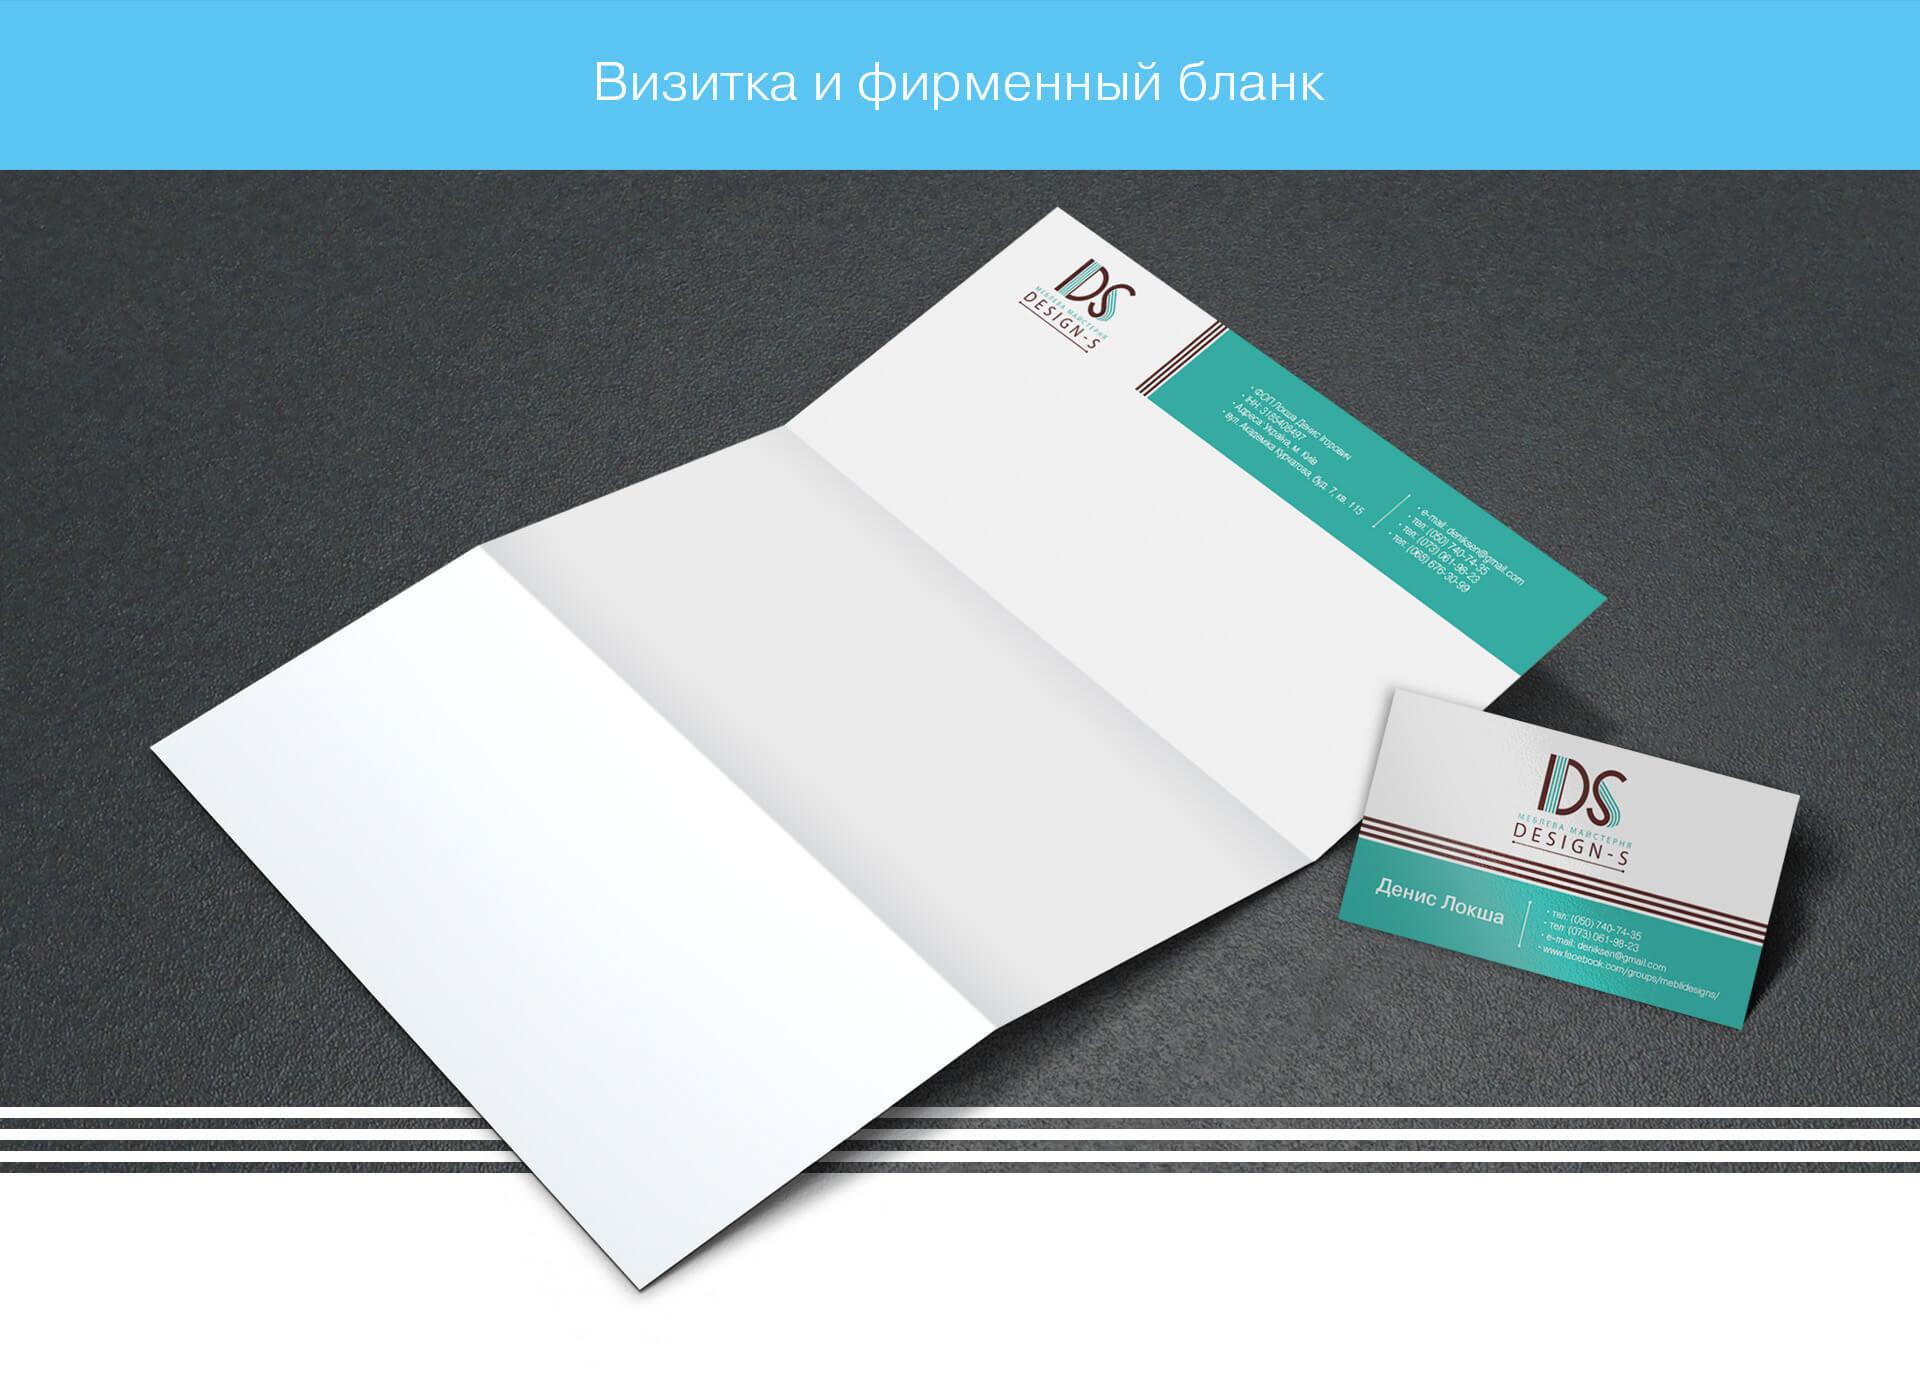 Prokochuk_Irina_Design-S_6_